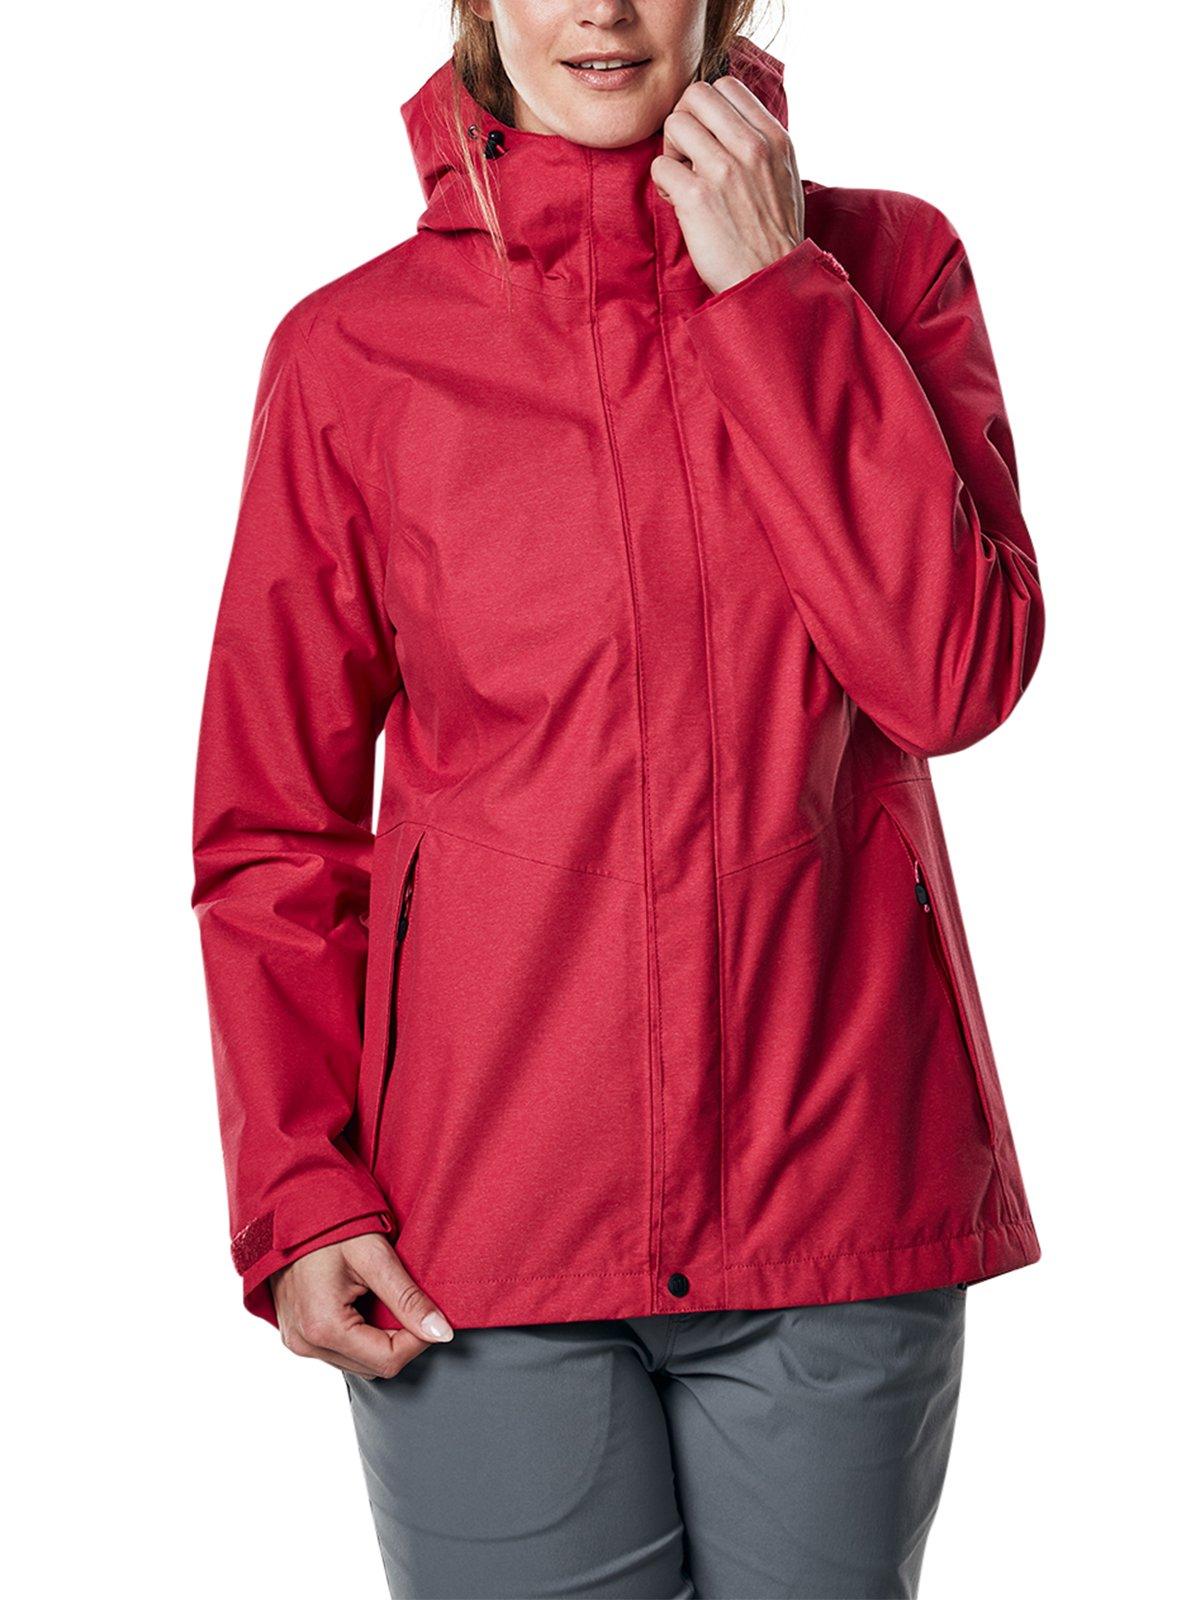 71m F1jvL4L - Berghaus Women's Elara Waterproof Jacket